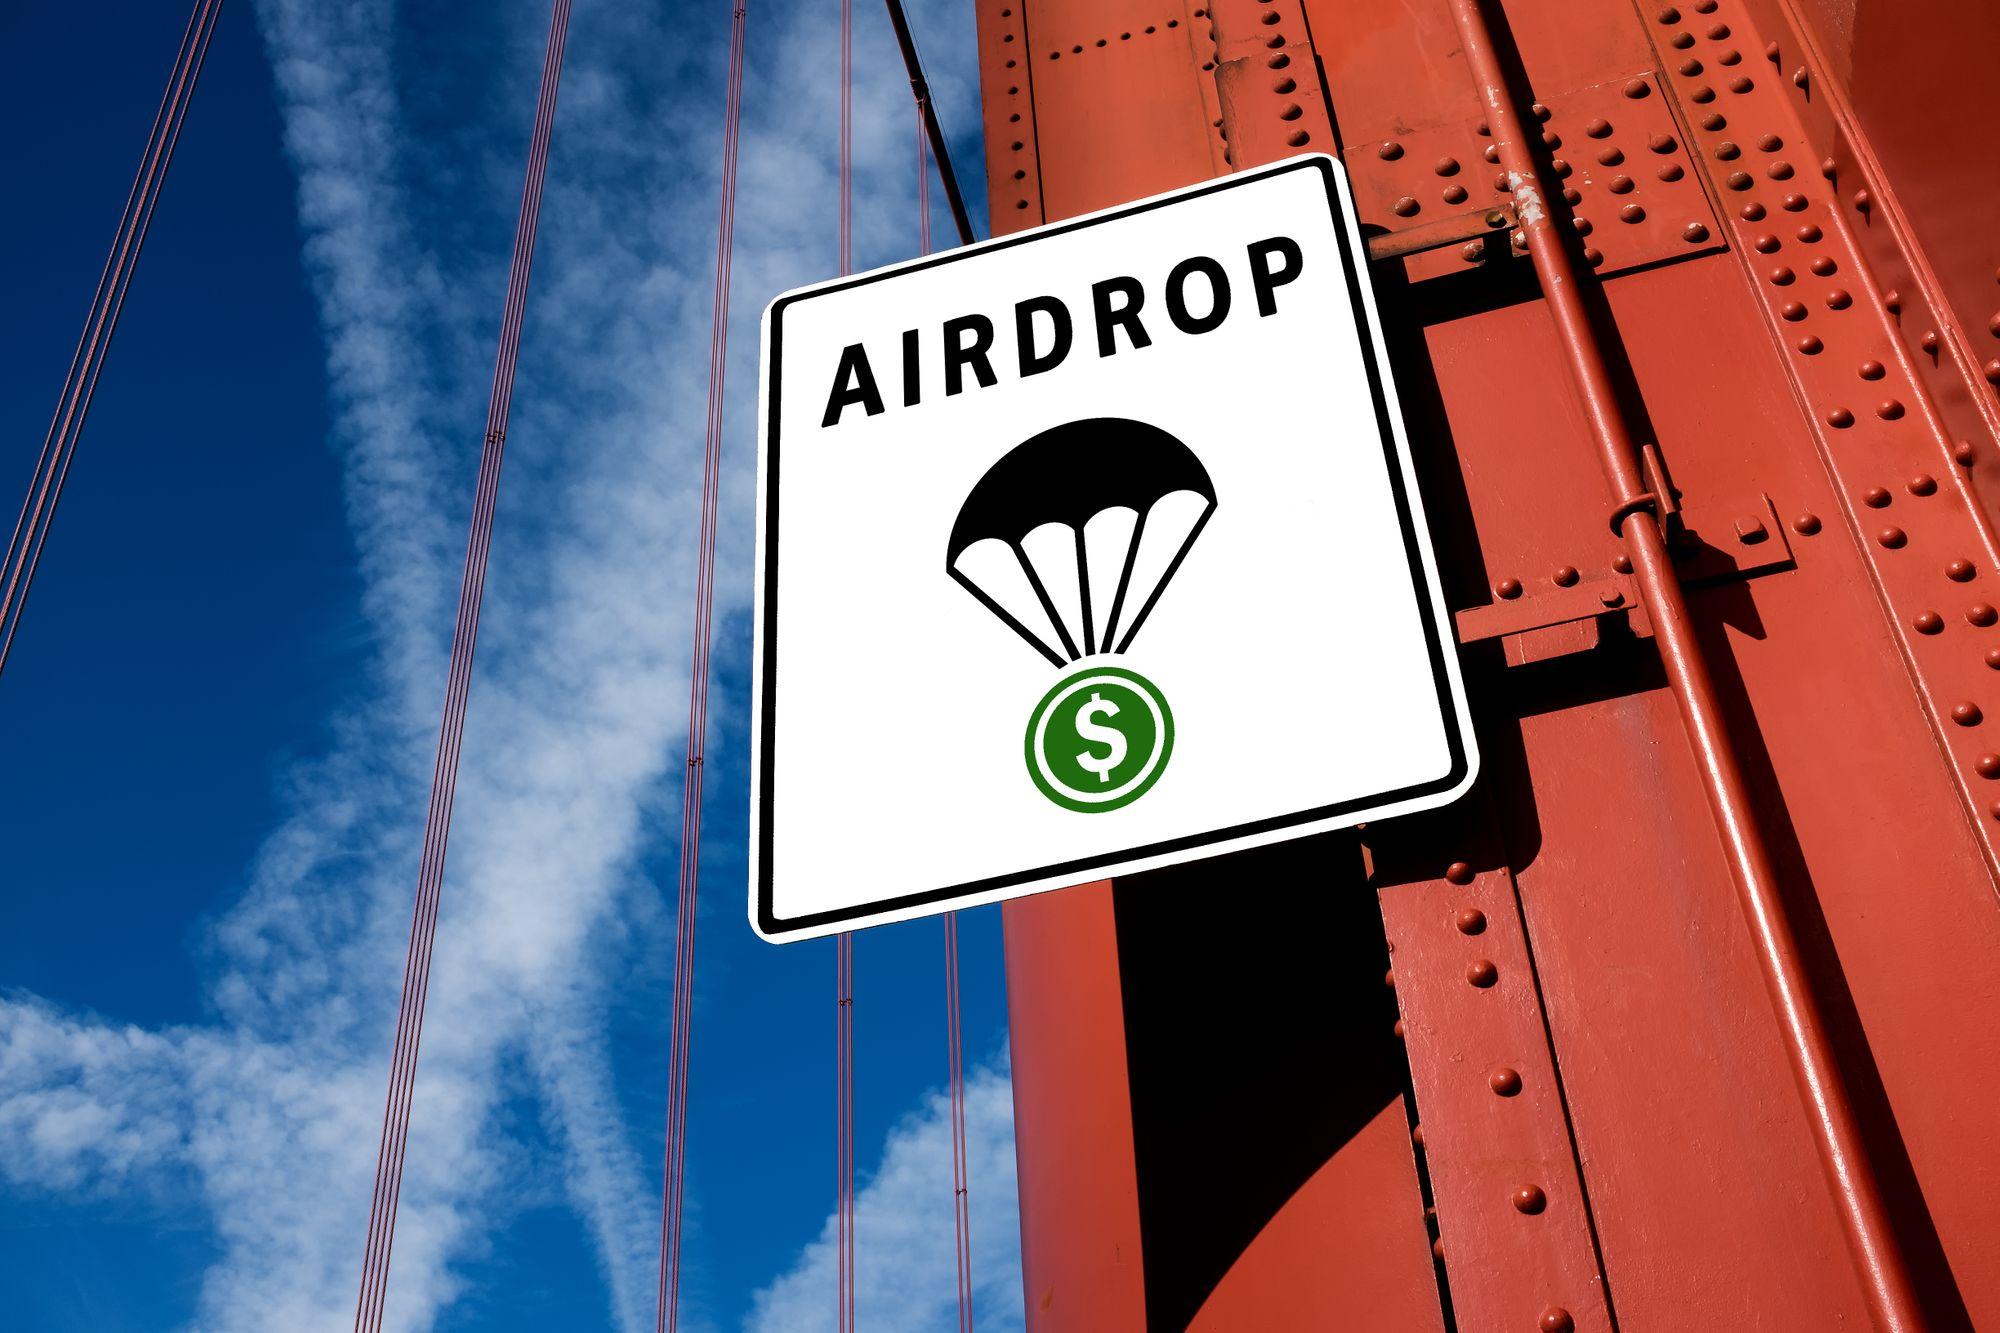 XRP保有者向けの「Sparkトークン」エアドロップとは?暗号資産取引所の対応内容について解説